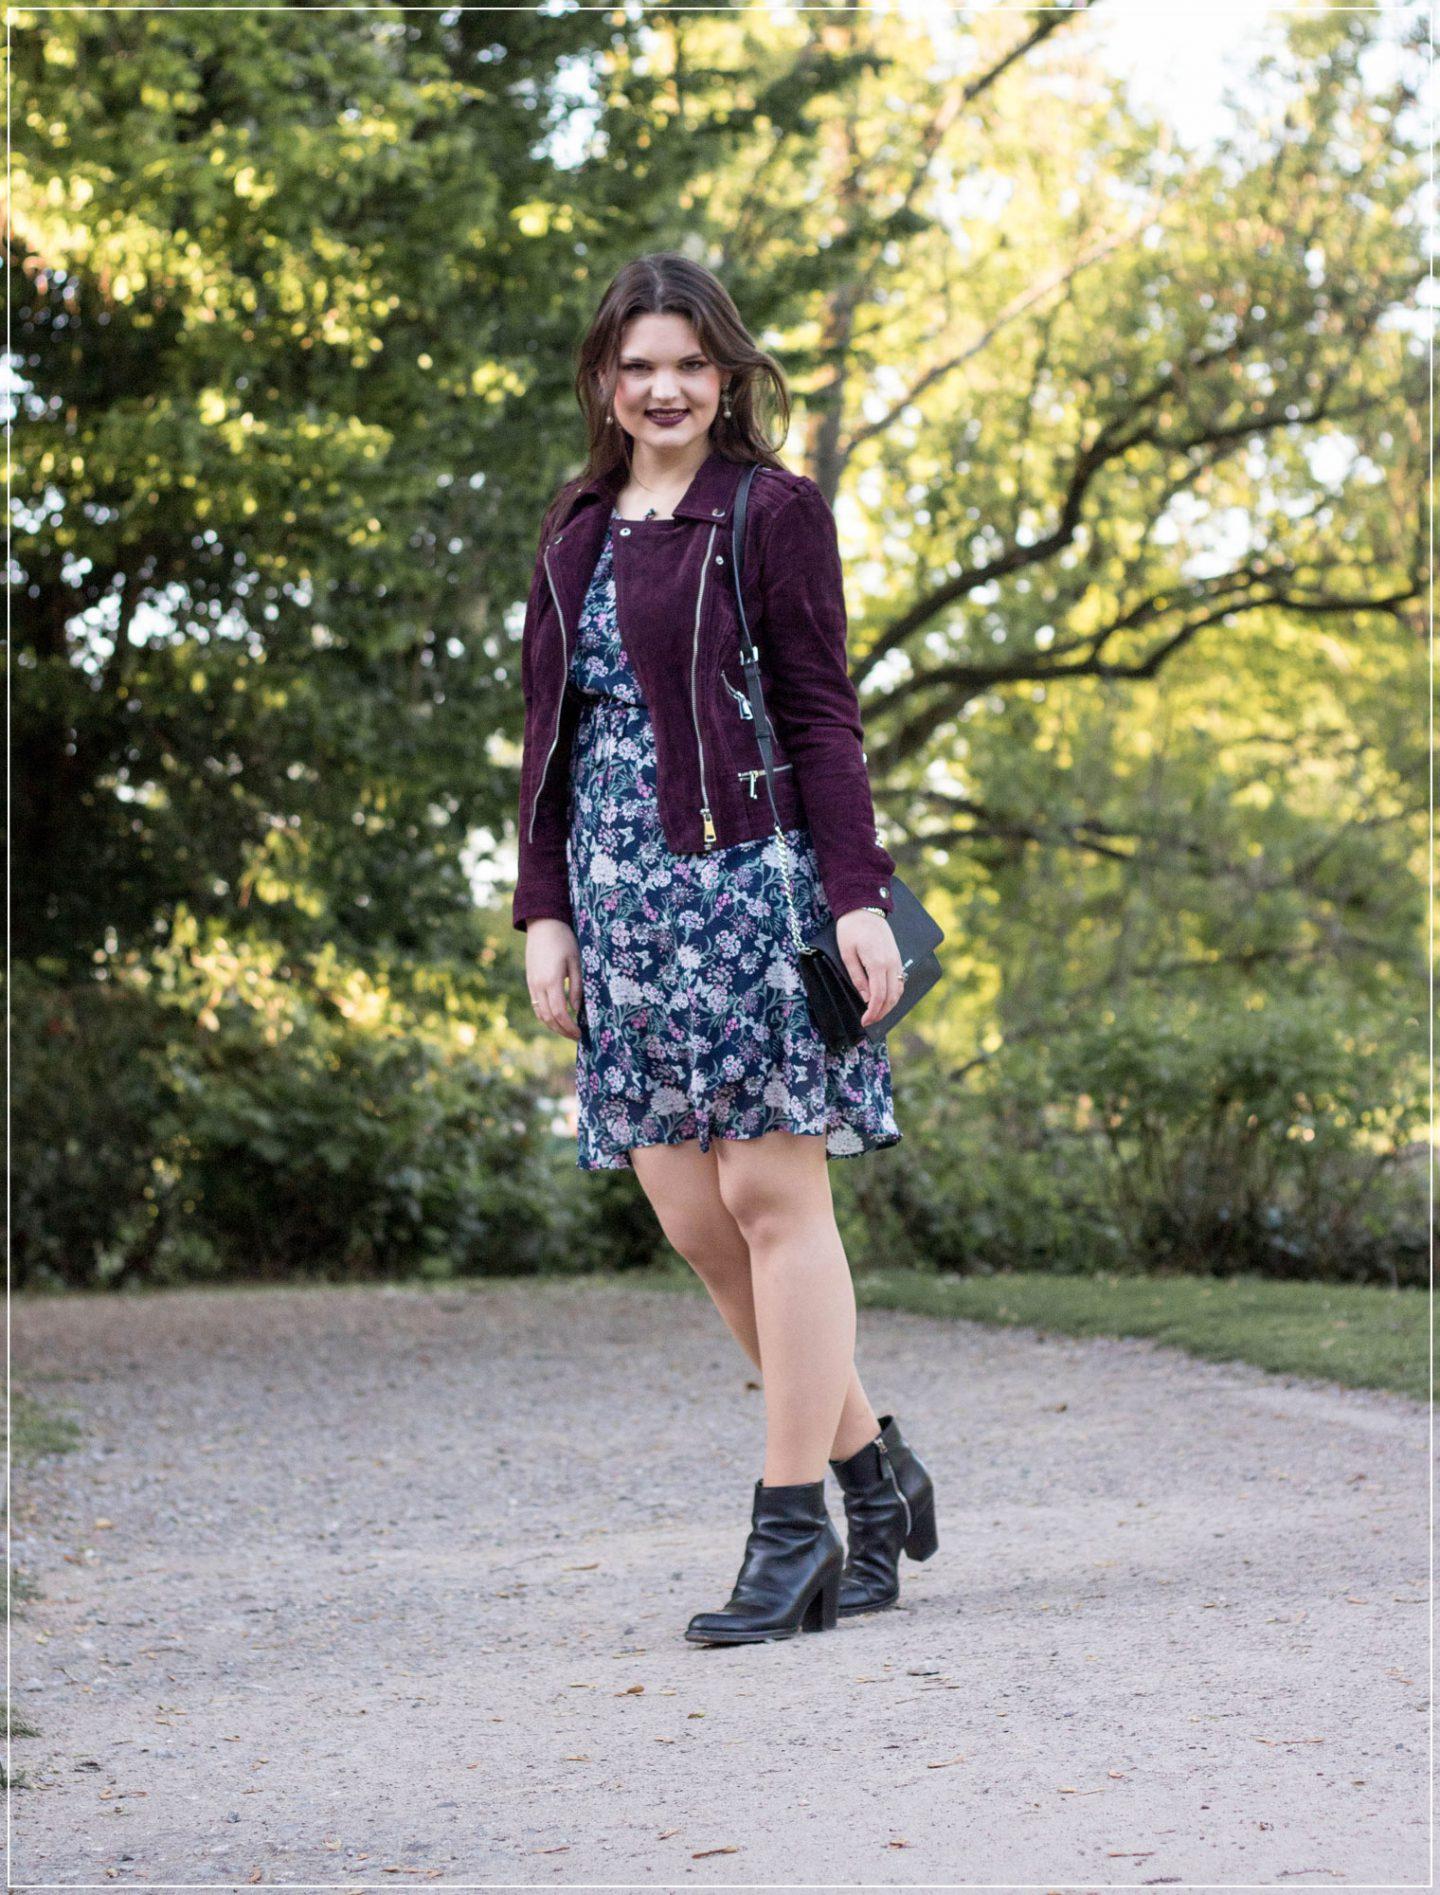 Frühlingslook, Springstyle, Blumenprint, Flowerdress, Jeans Fritz, Blumenkleid kombinieren, Styleguide, Outfitinspiration, Modebloggerin, Fashionbloggerin, Modeblog, Ruhrgebiet